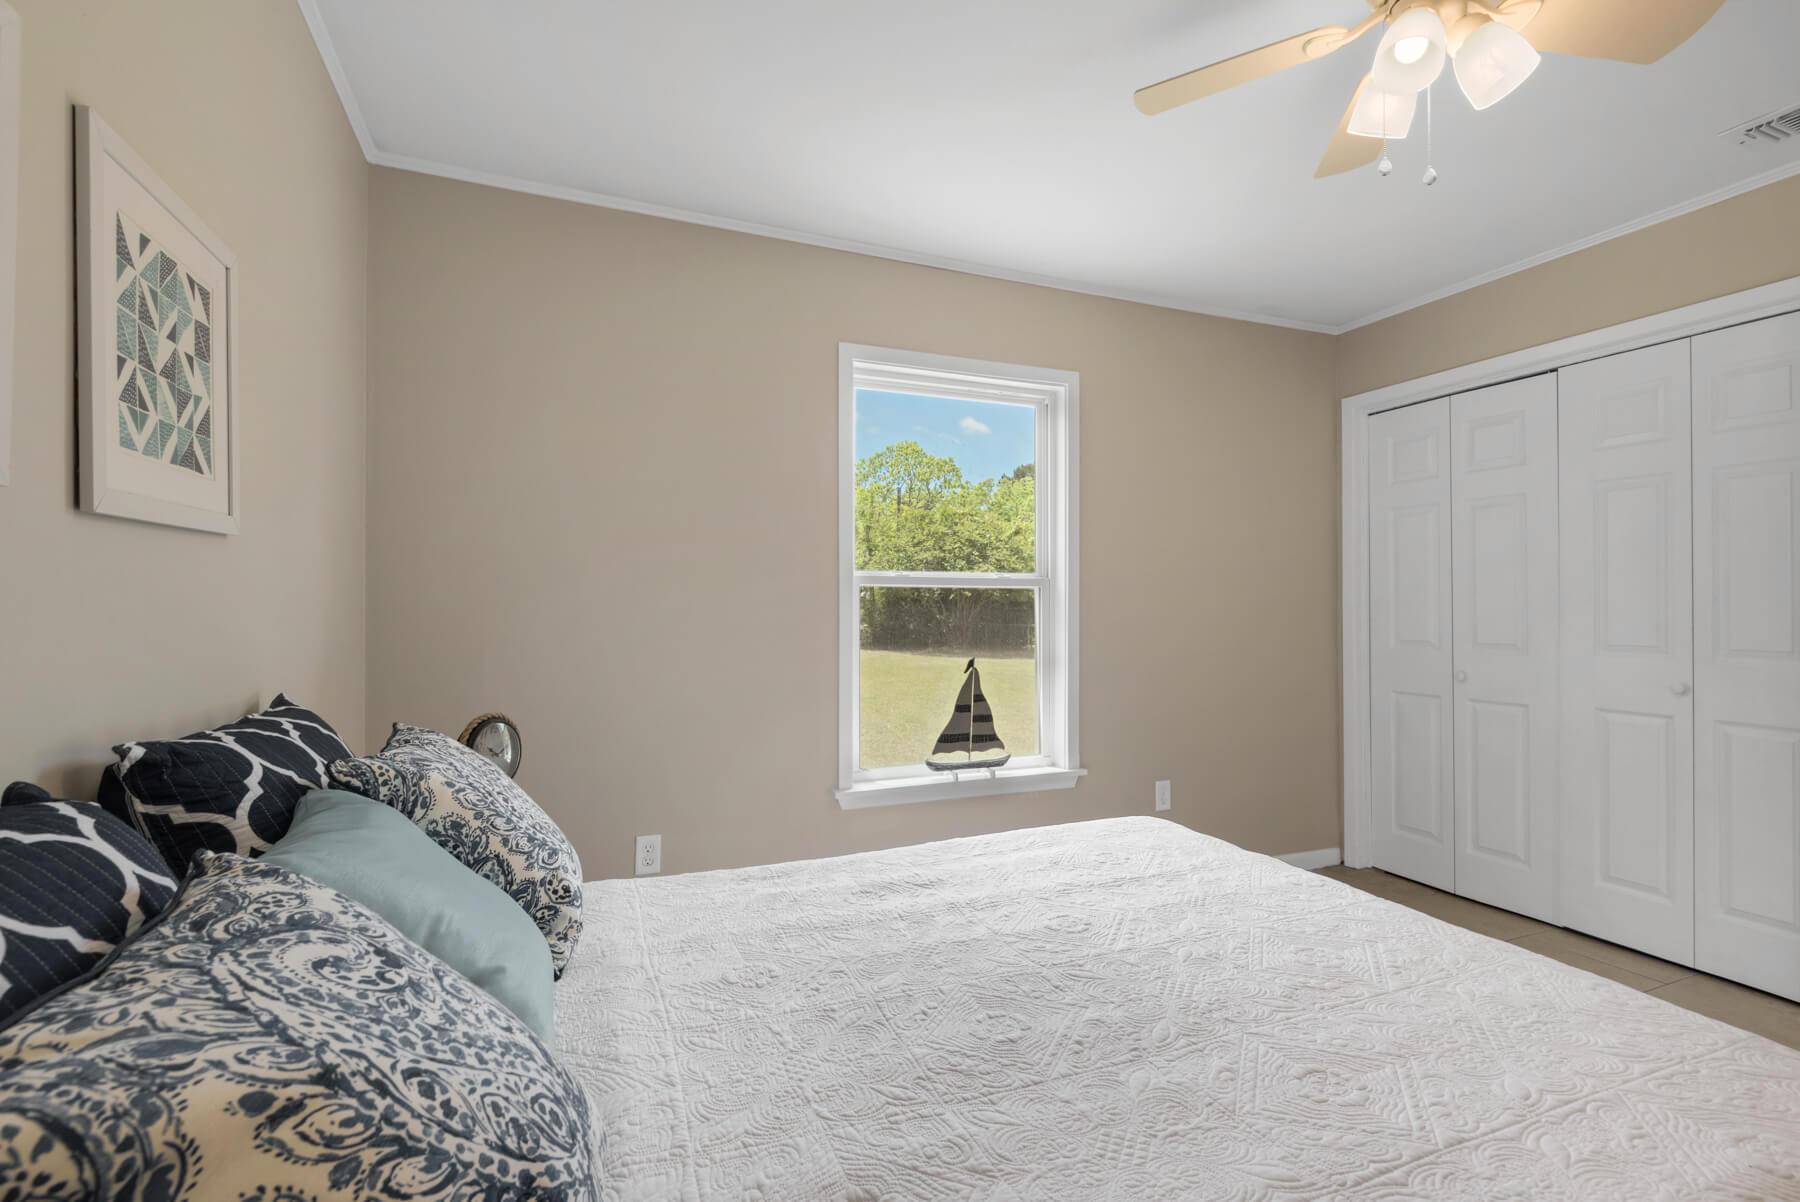 7466 Twin Beech Road Fairhope for Sale Urban Property bedroom view 2